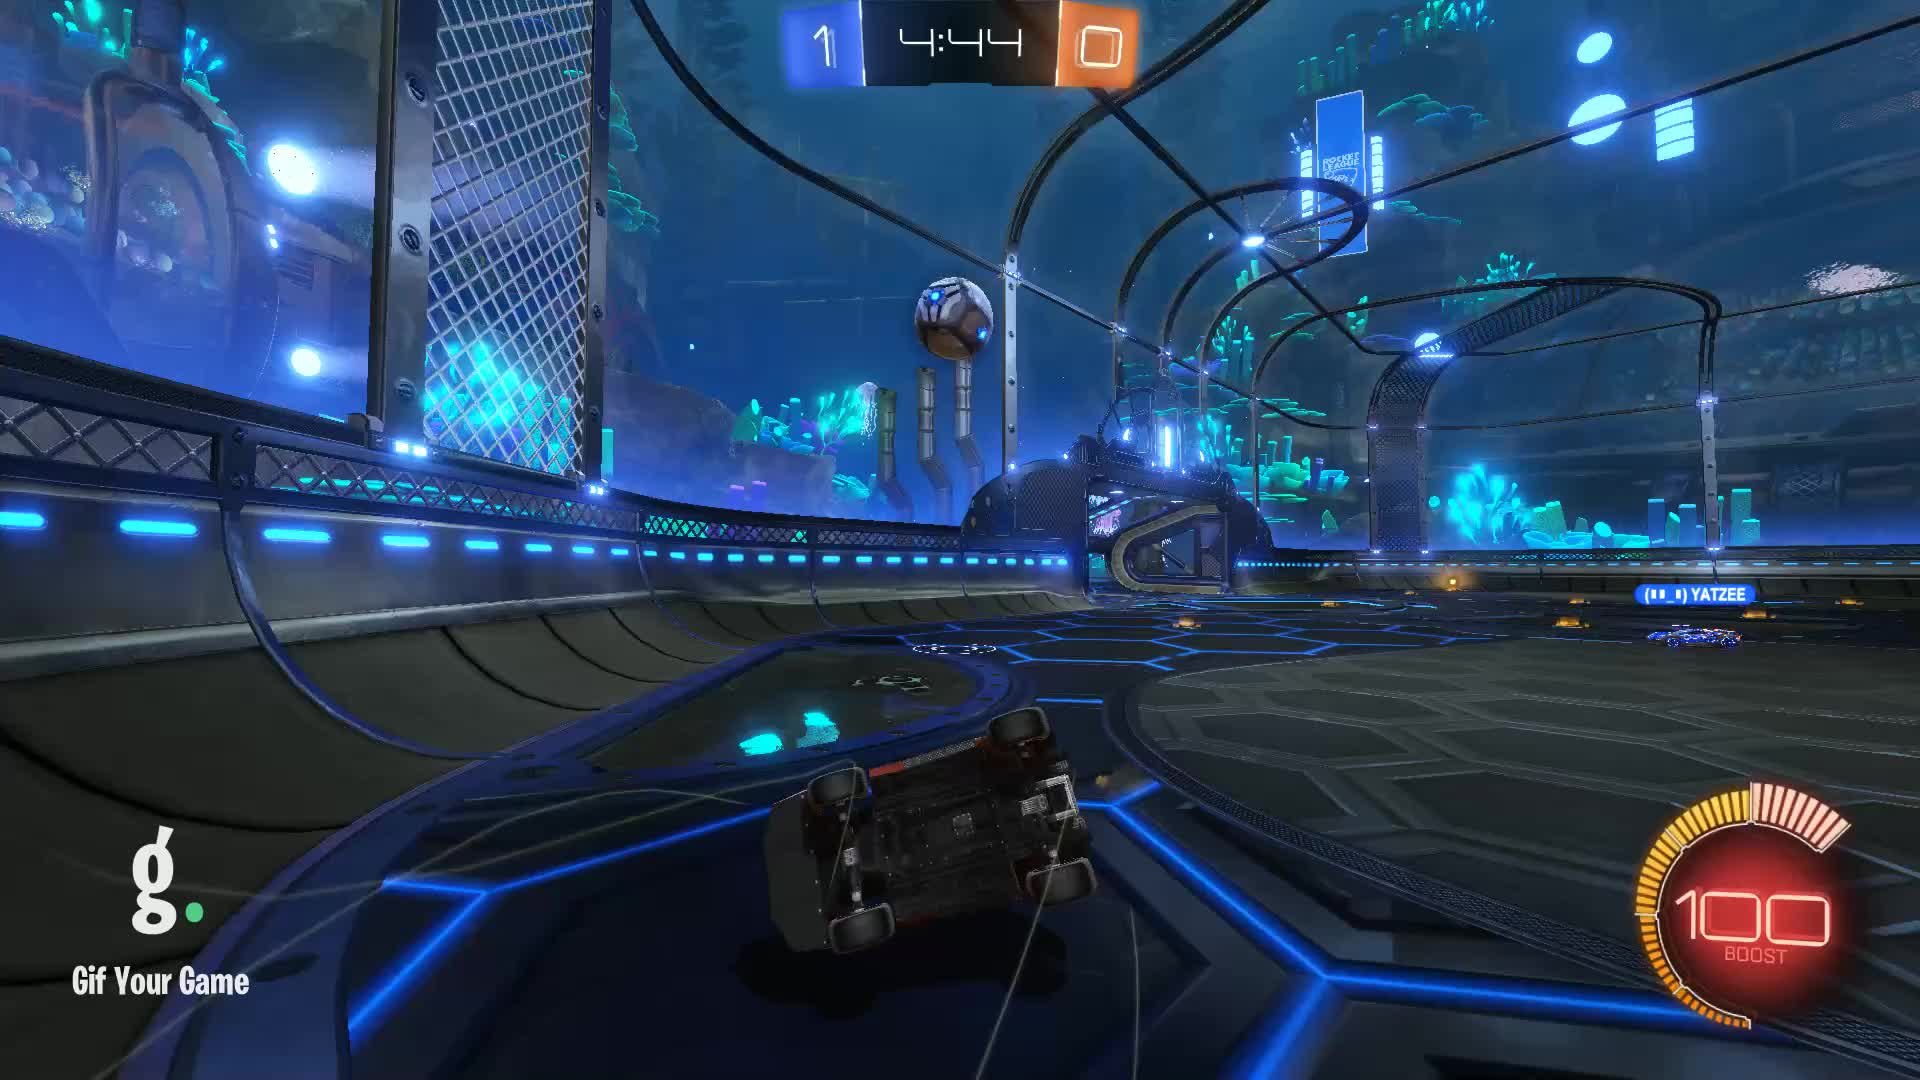 Gif Your Game, GifYourGame, Goal, Obi, Rocket League, RocketLeague, Goal 2: Obi GIFs